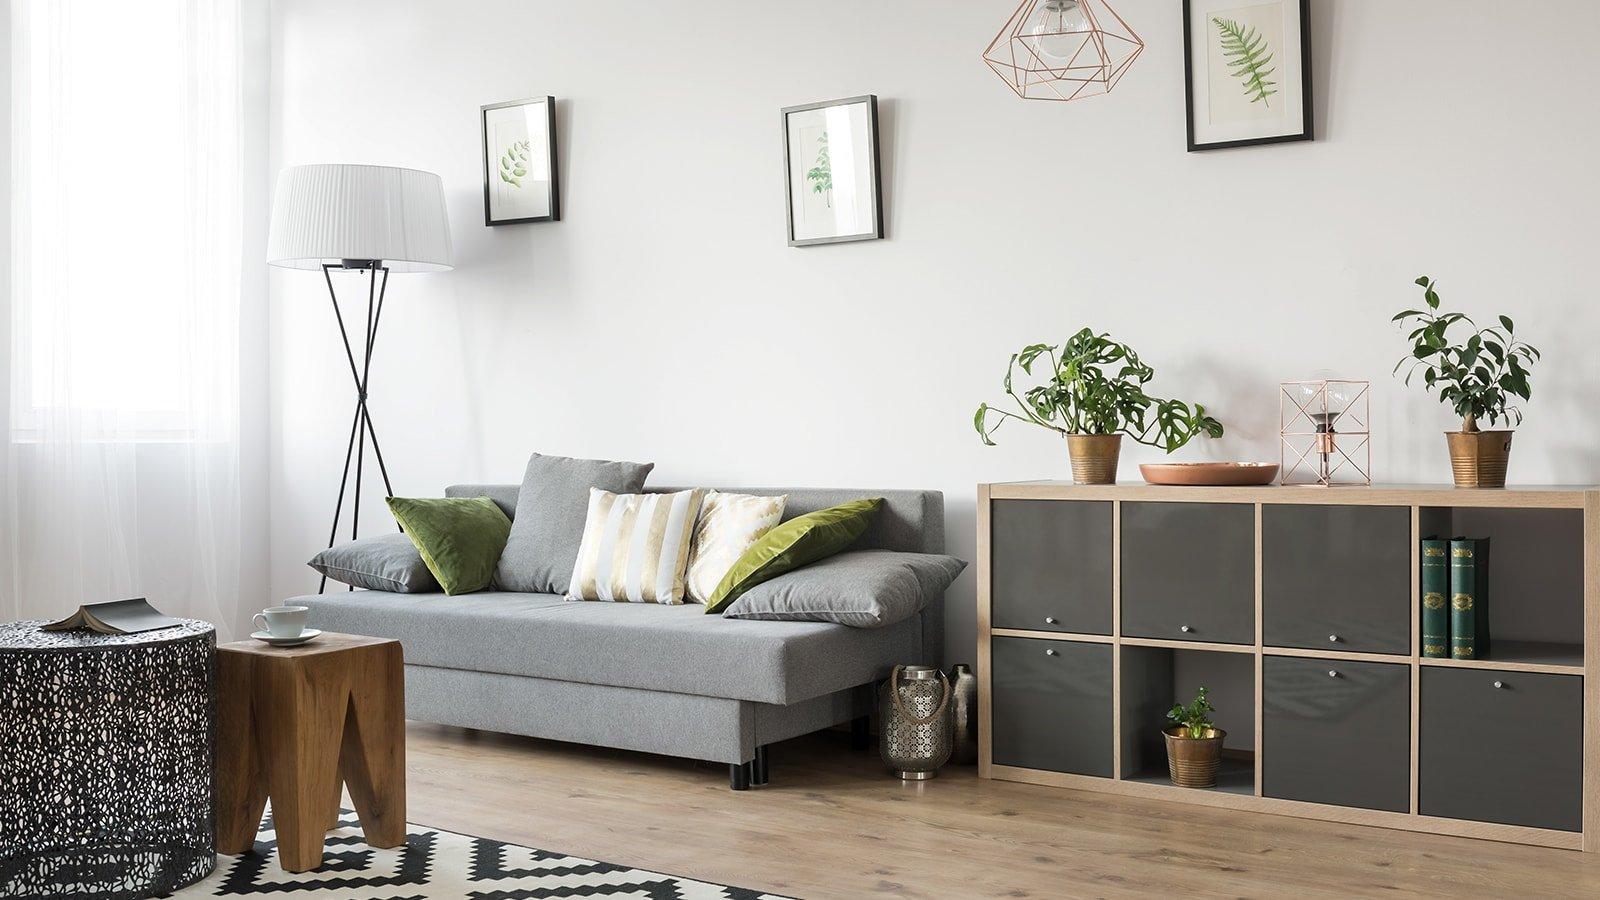 Neutral themed living room